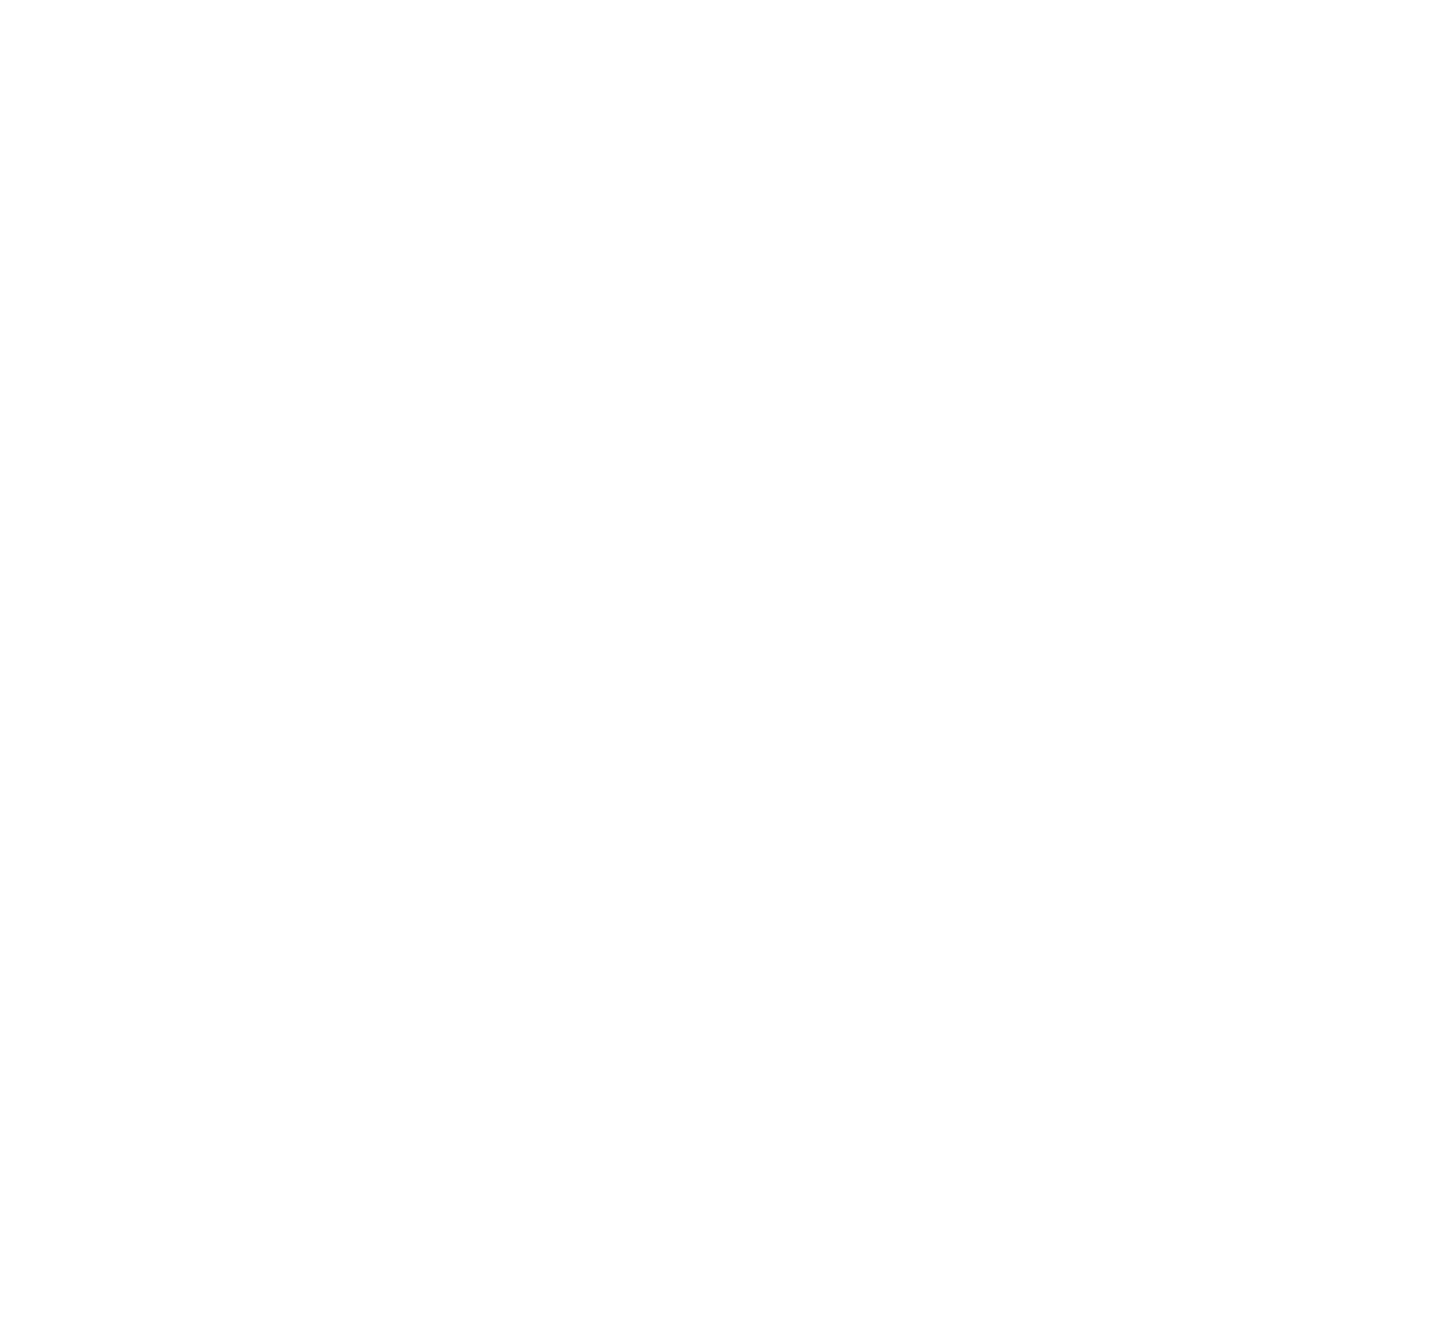 Dz – 23